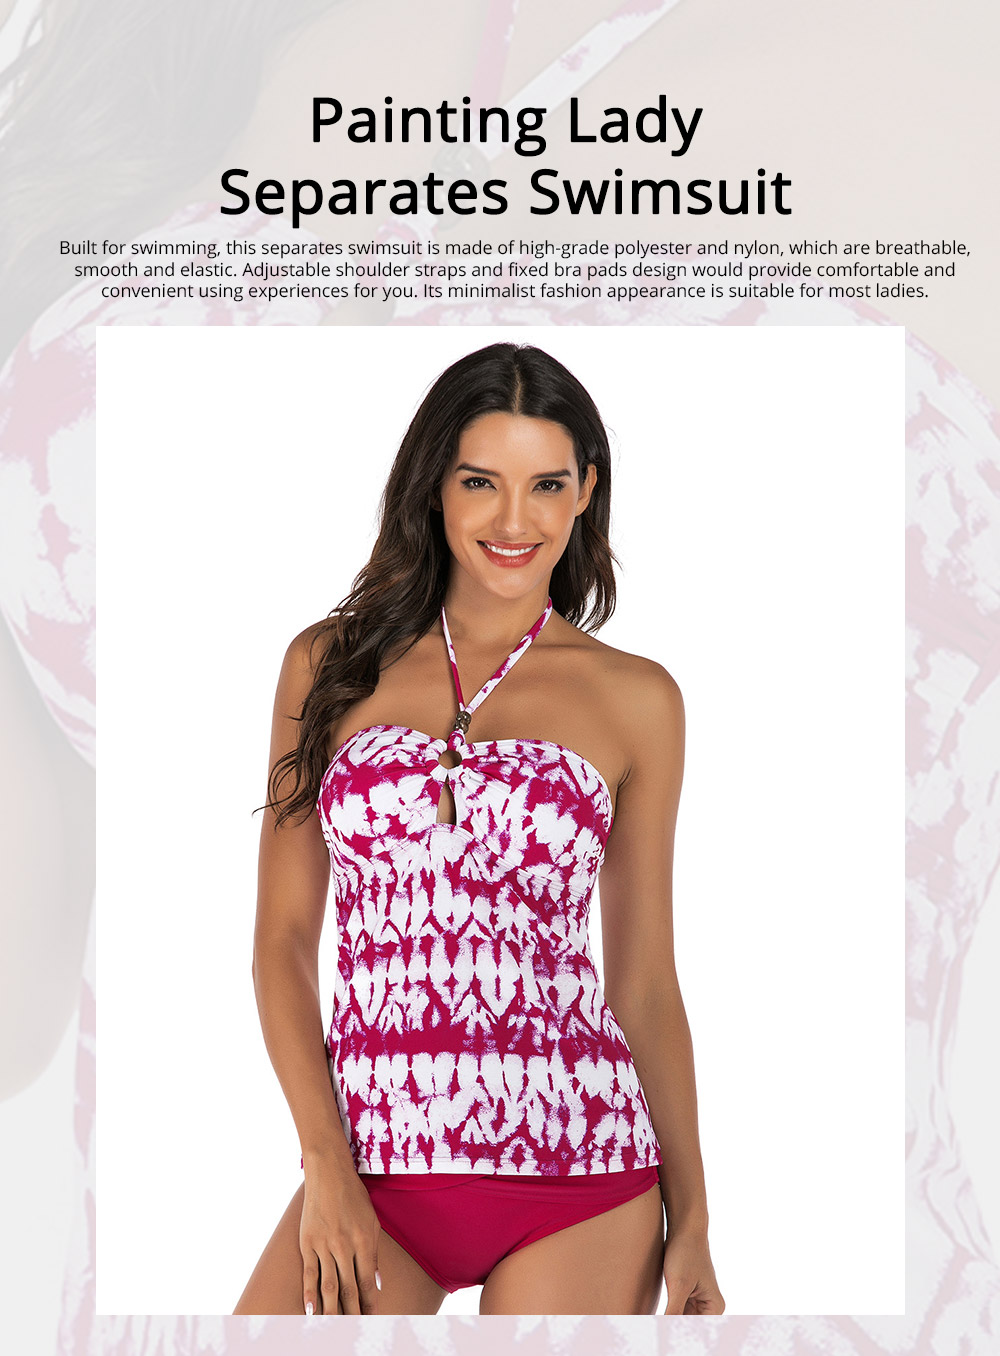 Fancy Sexy Painting Separates Adjustable Strap Swimsuit Bikini Stylish Triangle Swim Briefs Ladies Bikini 0